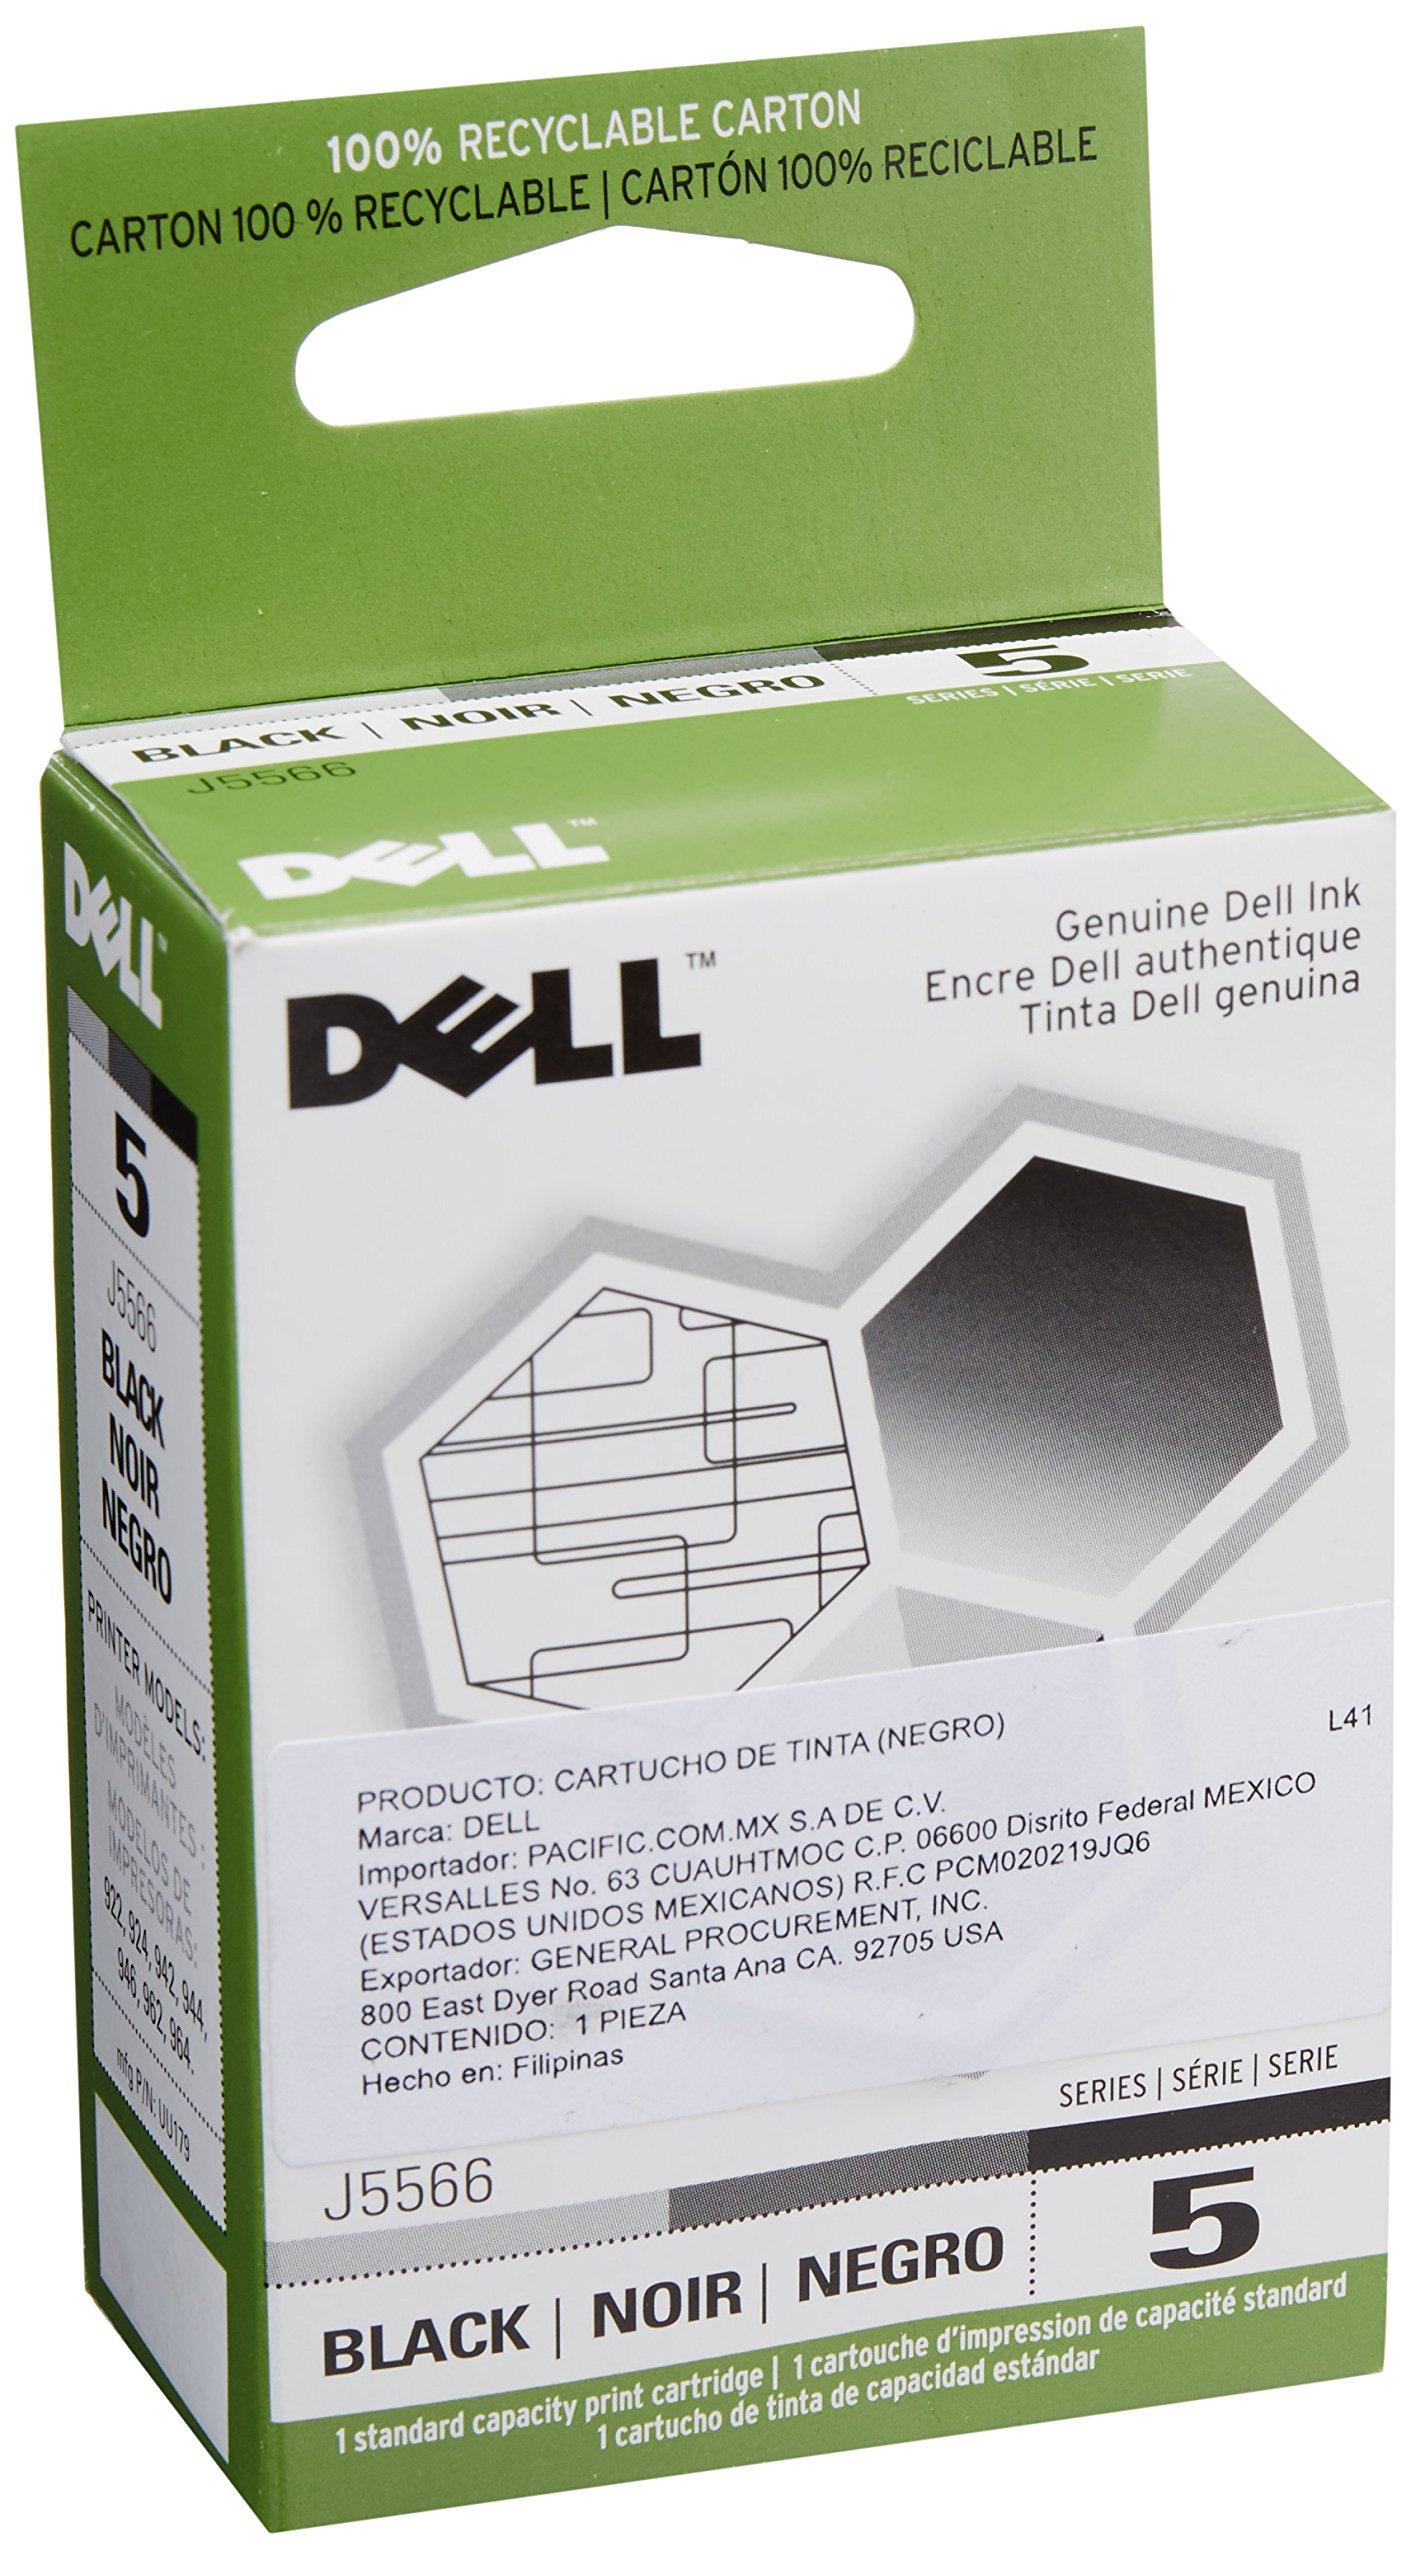 Dell Computer J5566 Dell Ink